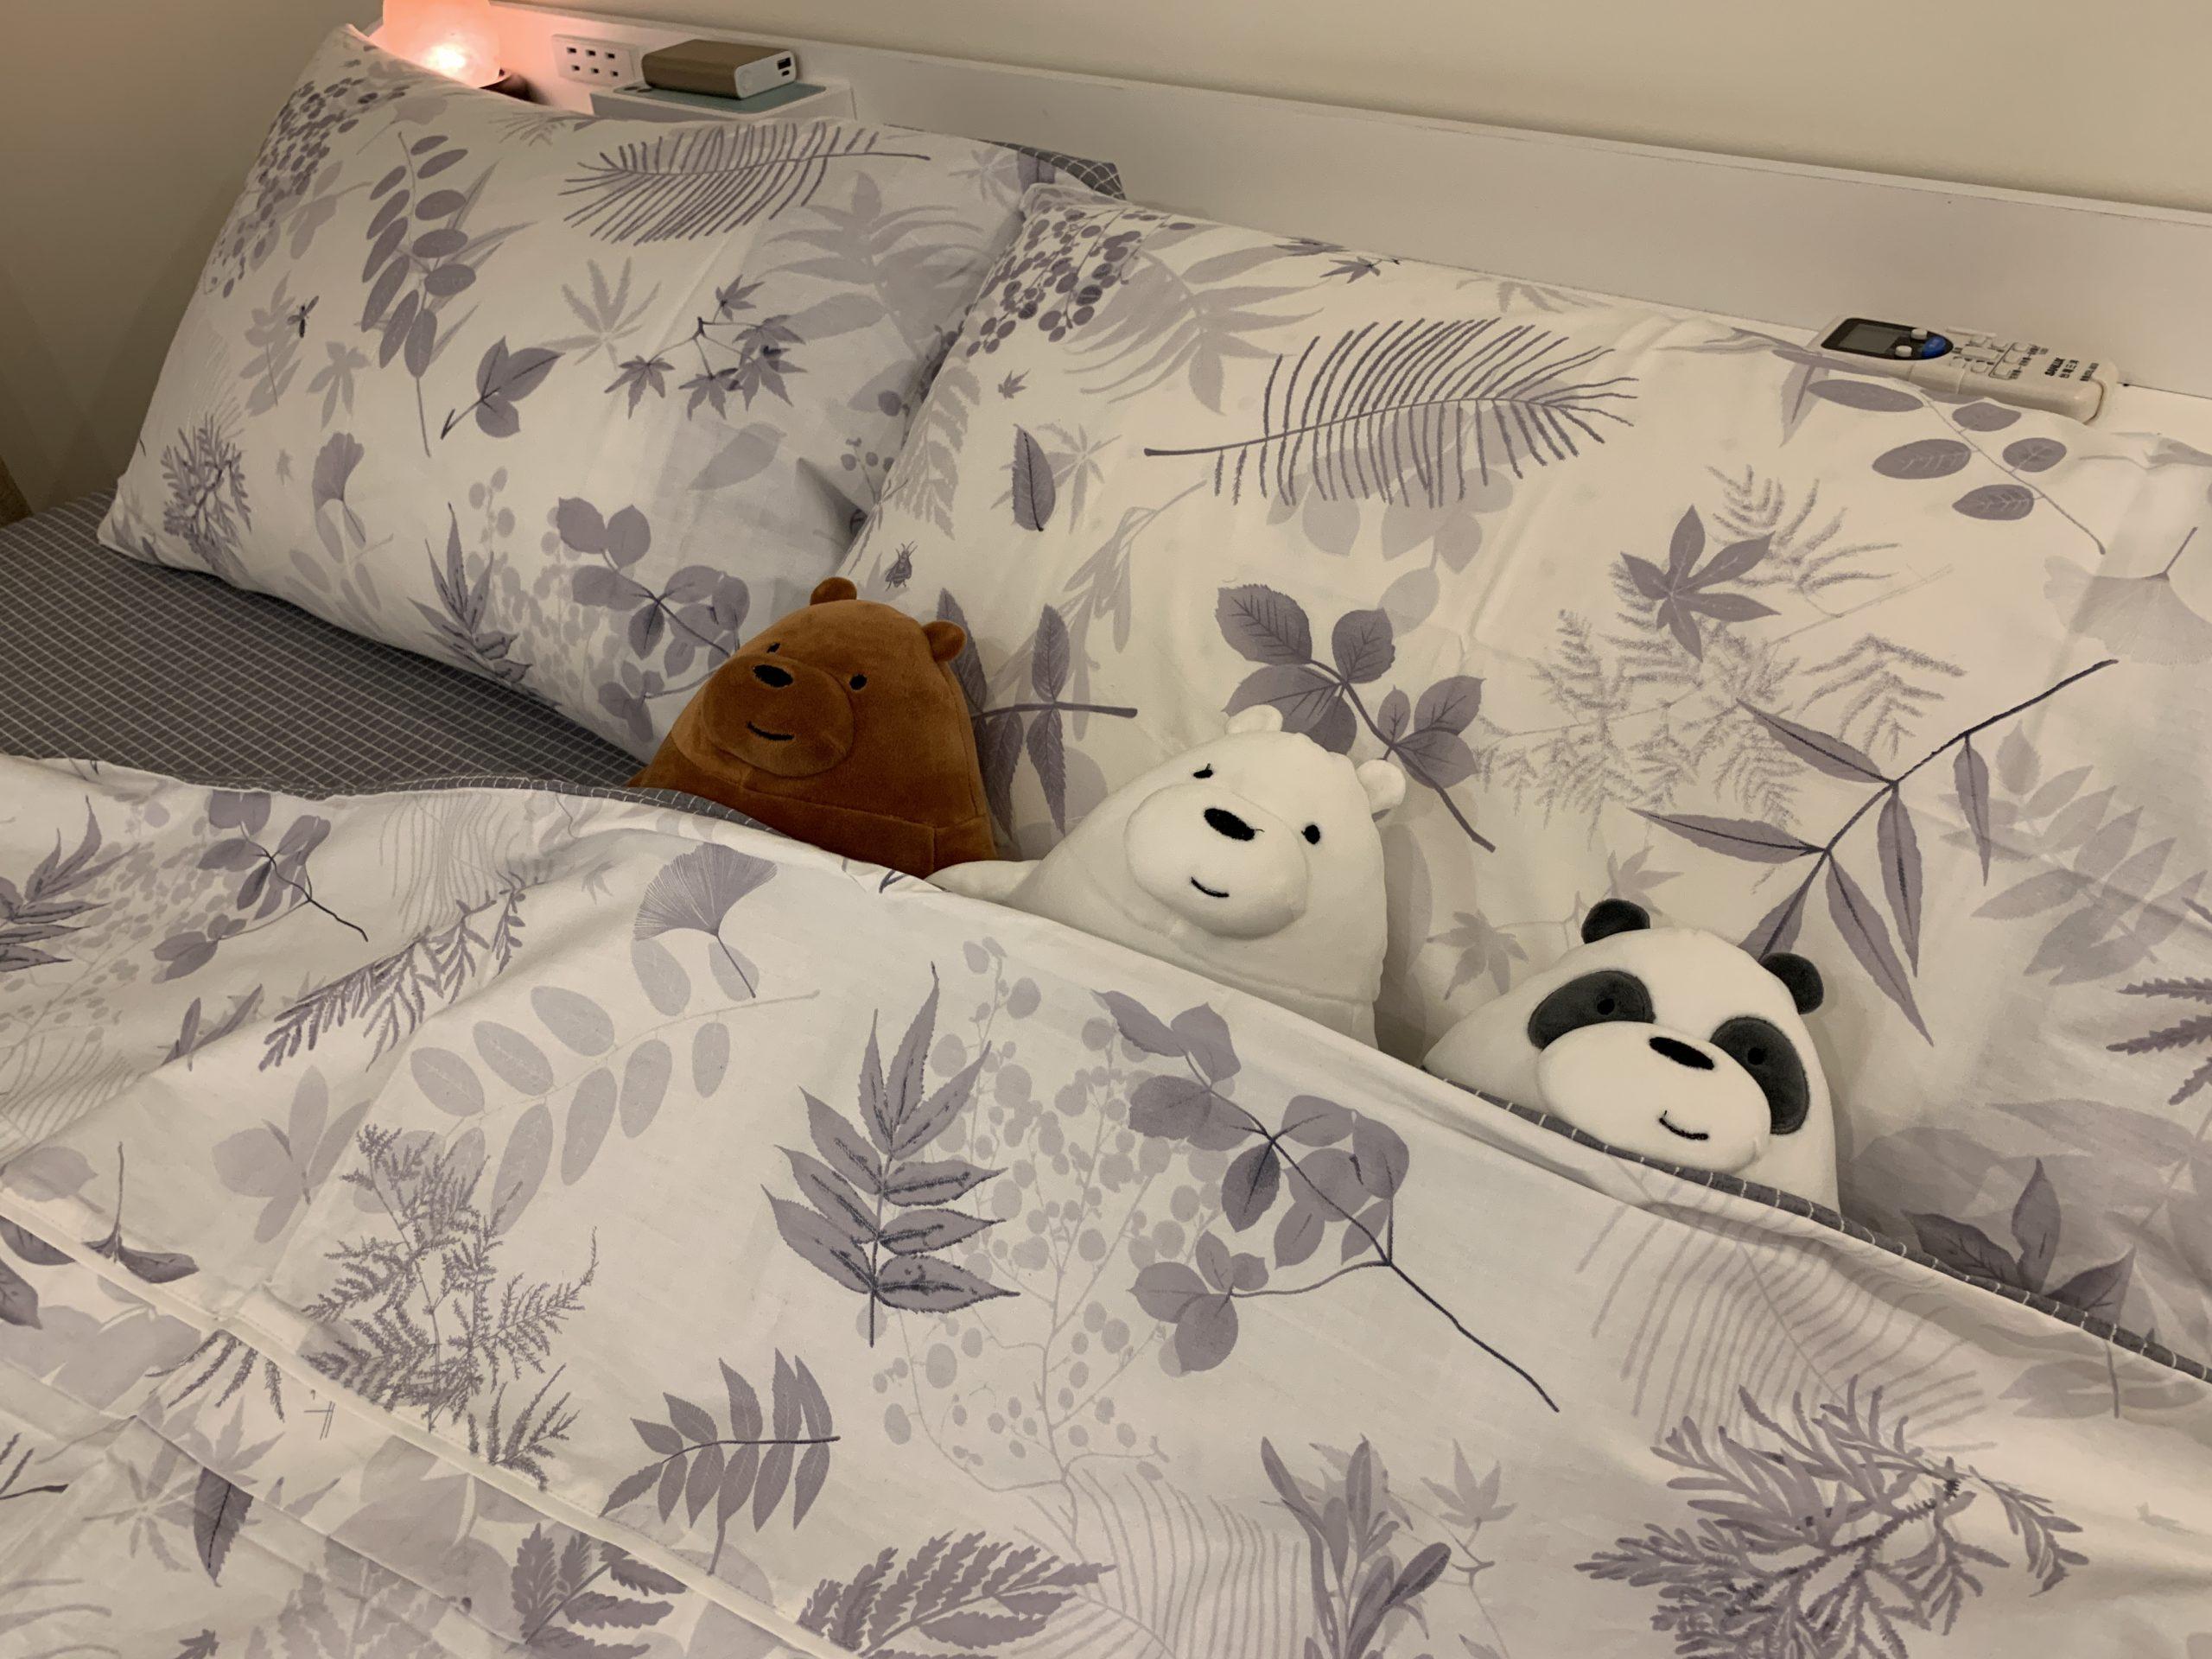 Annahome棉床本舖|碳化森林精梳棉床包組推薦,MIT台灣製造、透氣、滑順觸感舒適好眠 @秤瓶樂遊遊